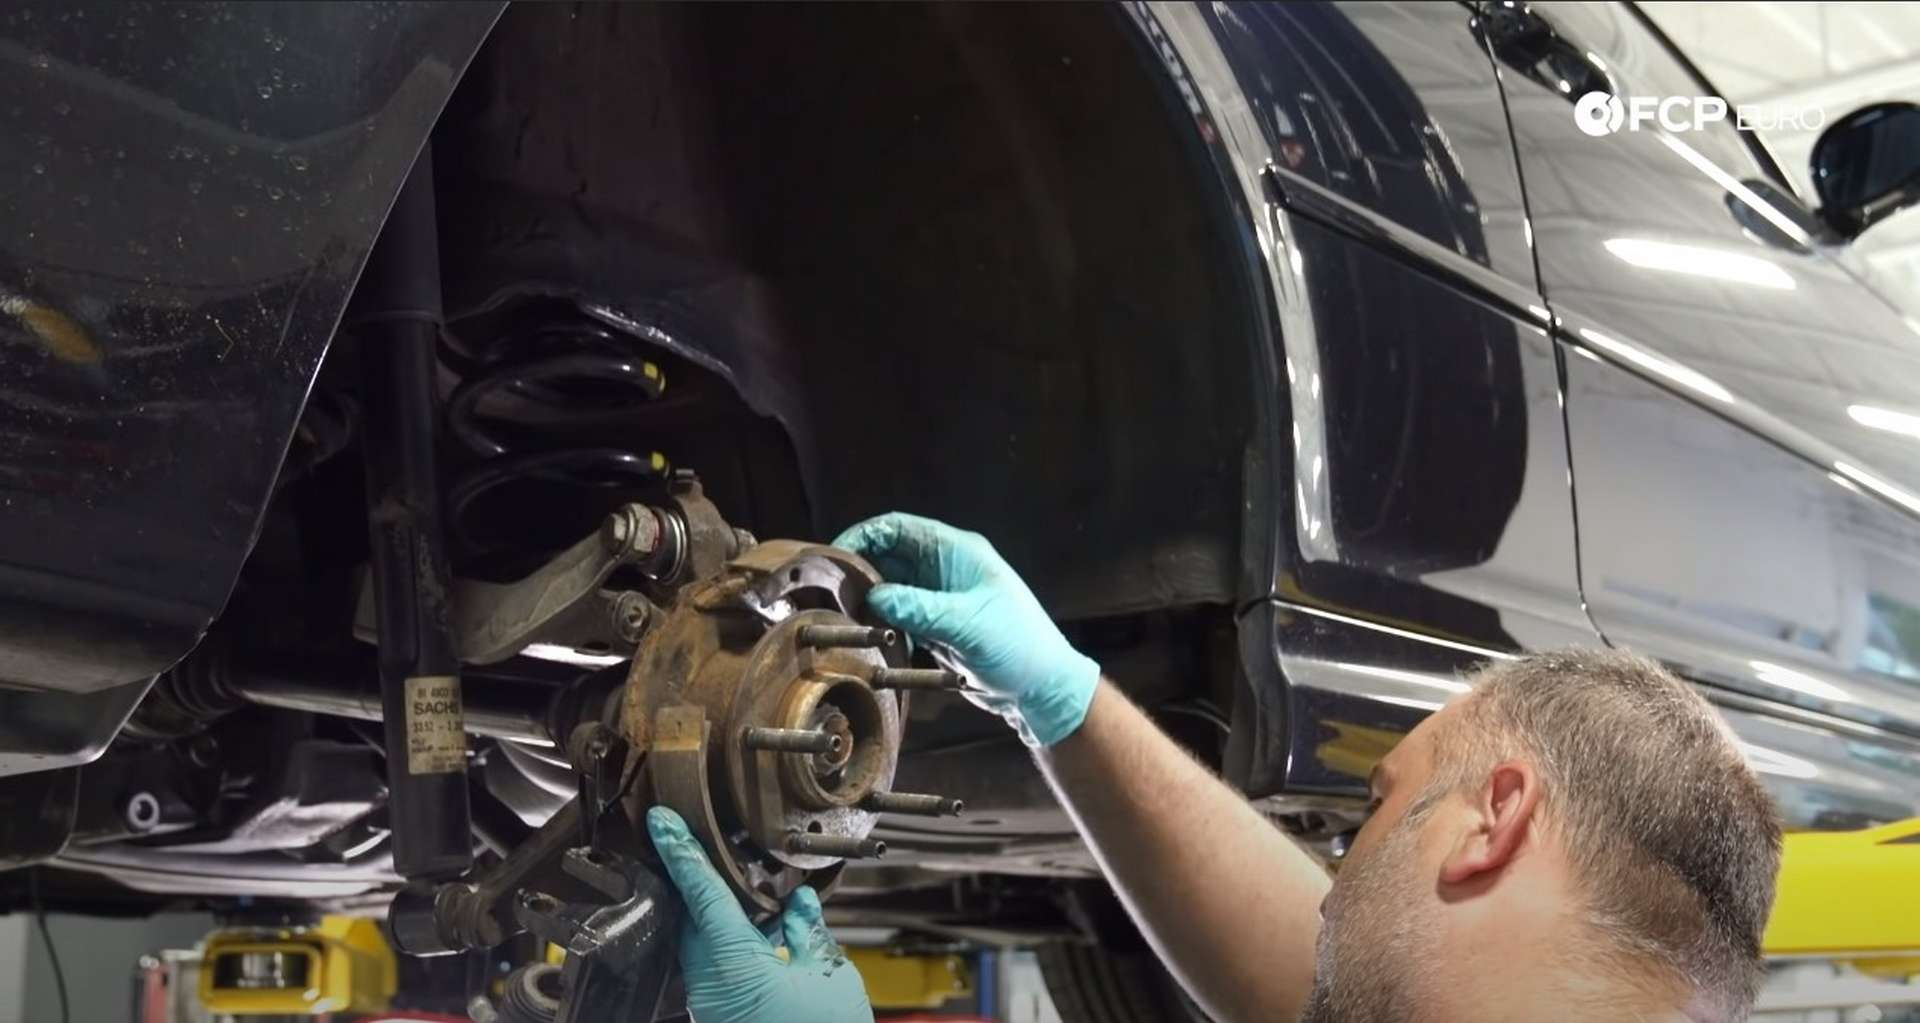 DIY E46 BMW M3 Rear Subframe Refresh Part 3 installing the shoe expander